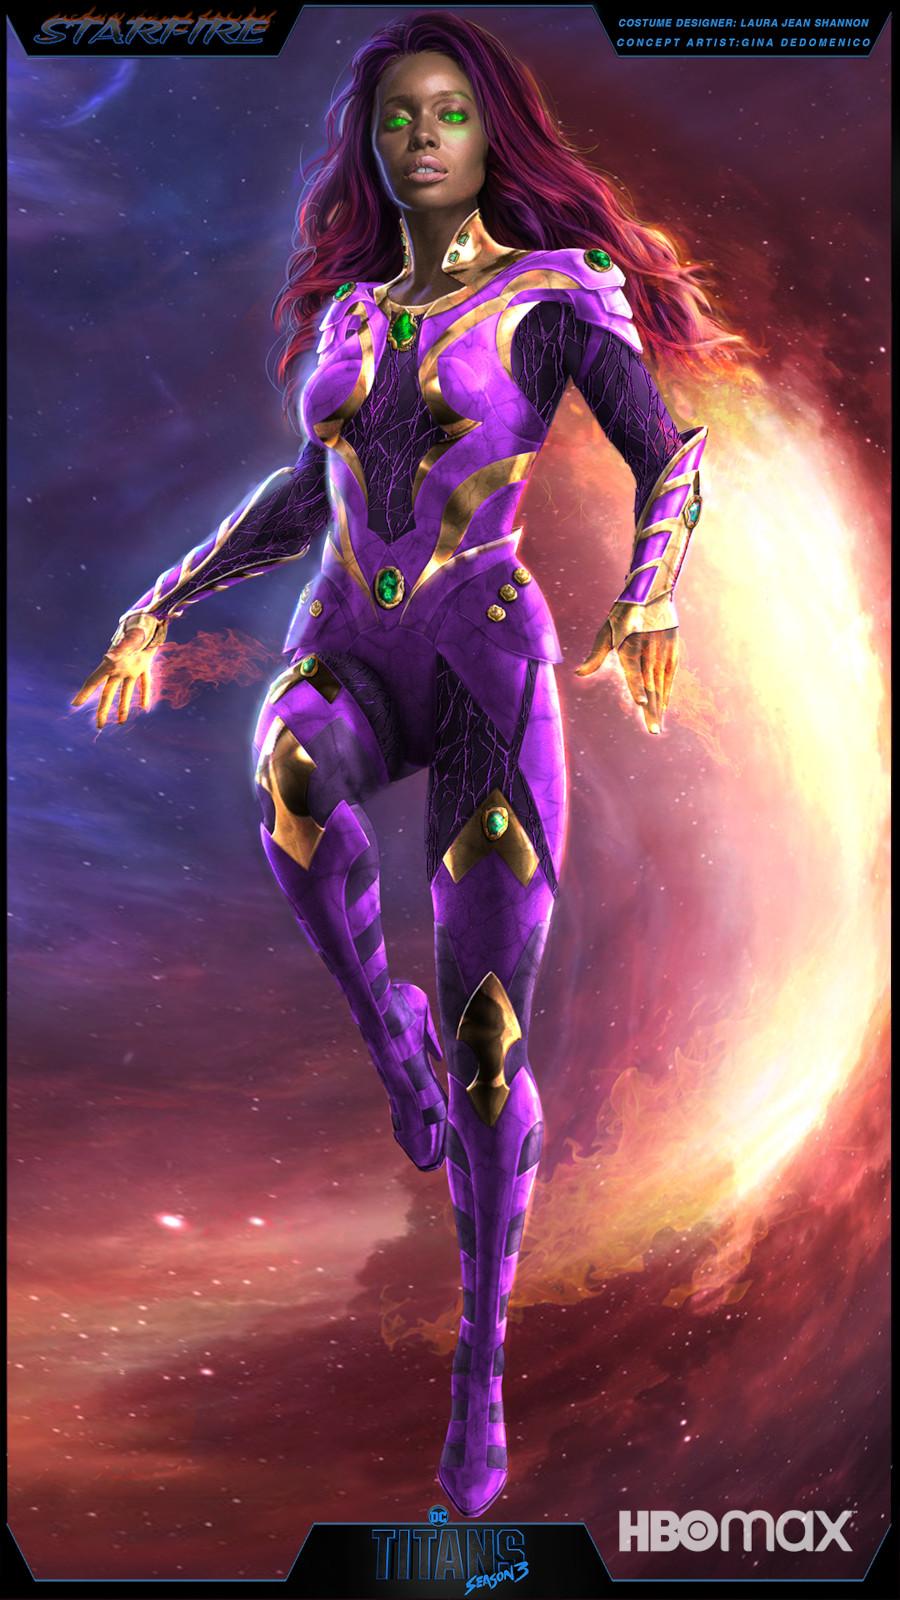 Starfire supersuit Titans Season 3